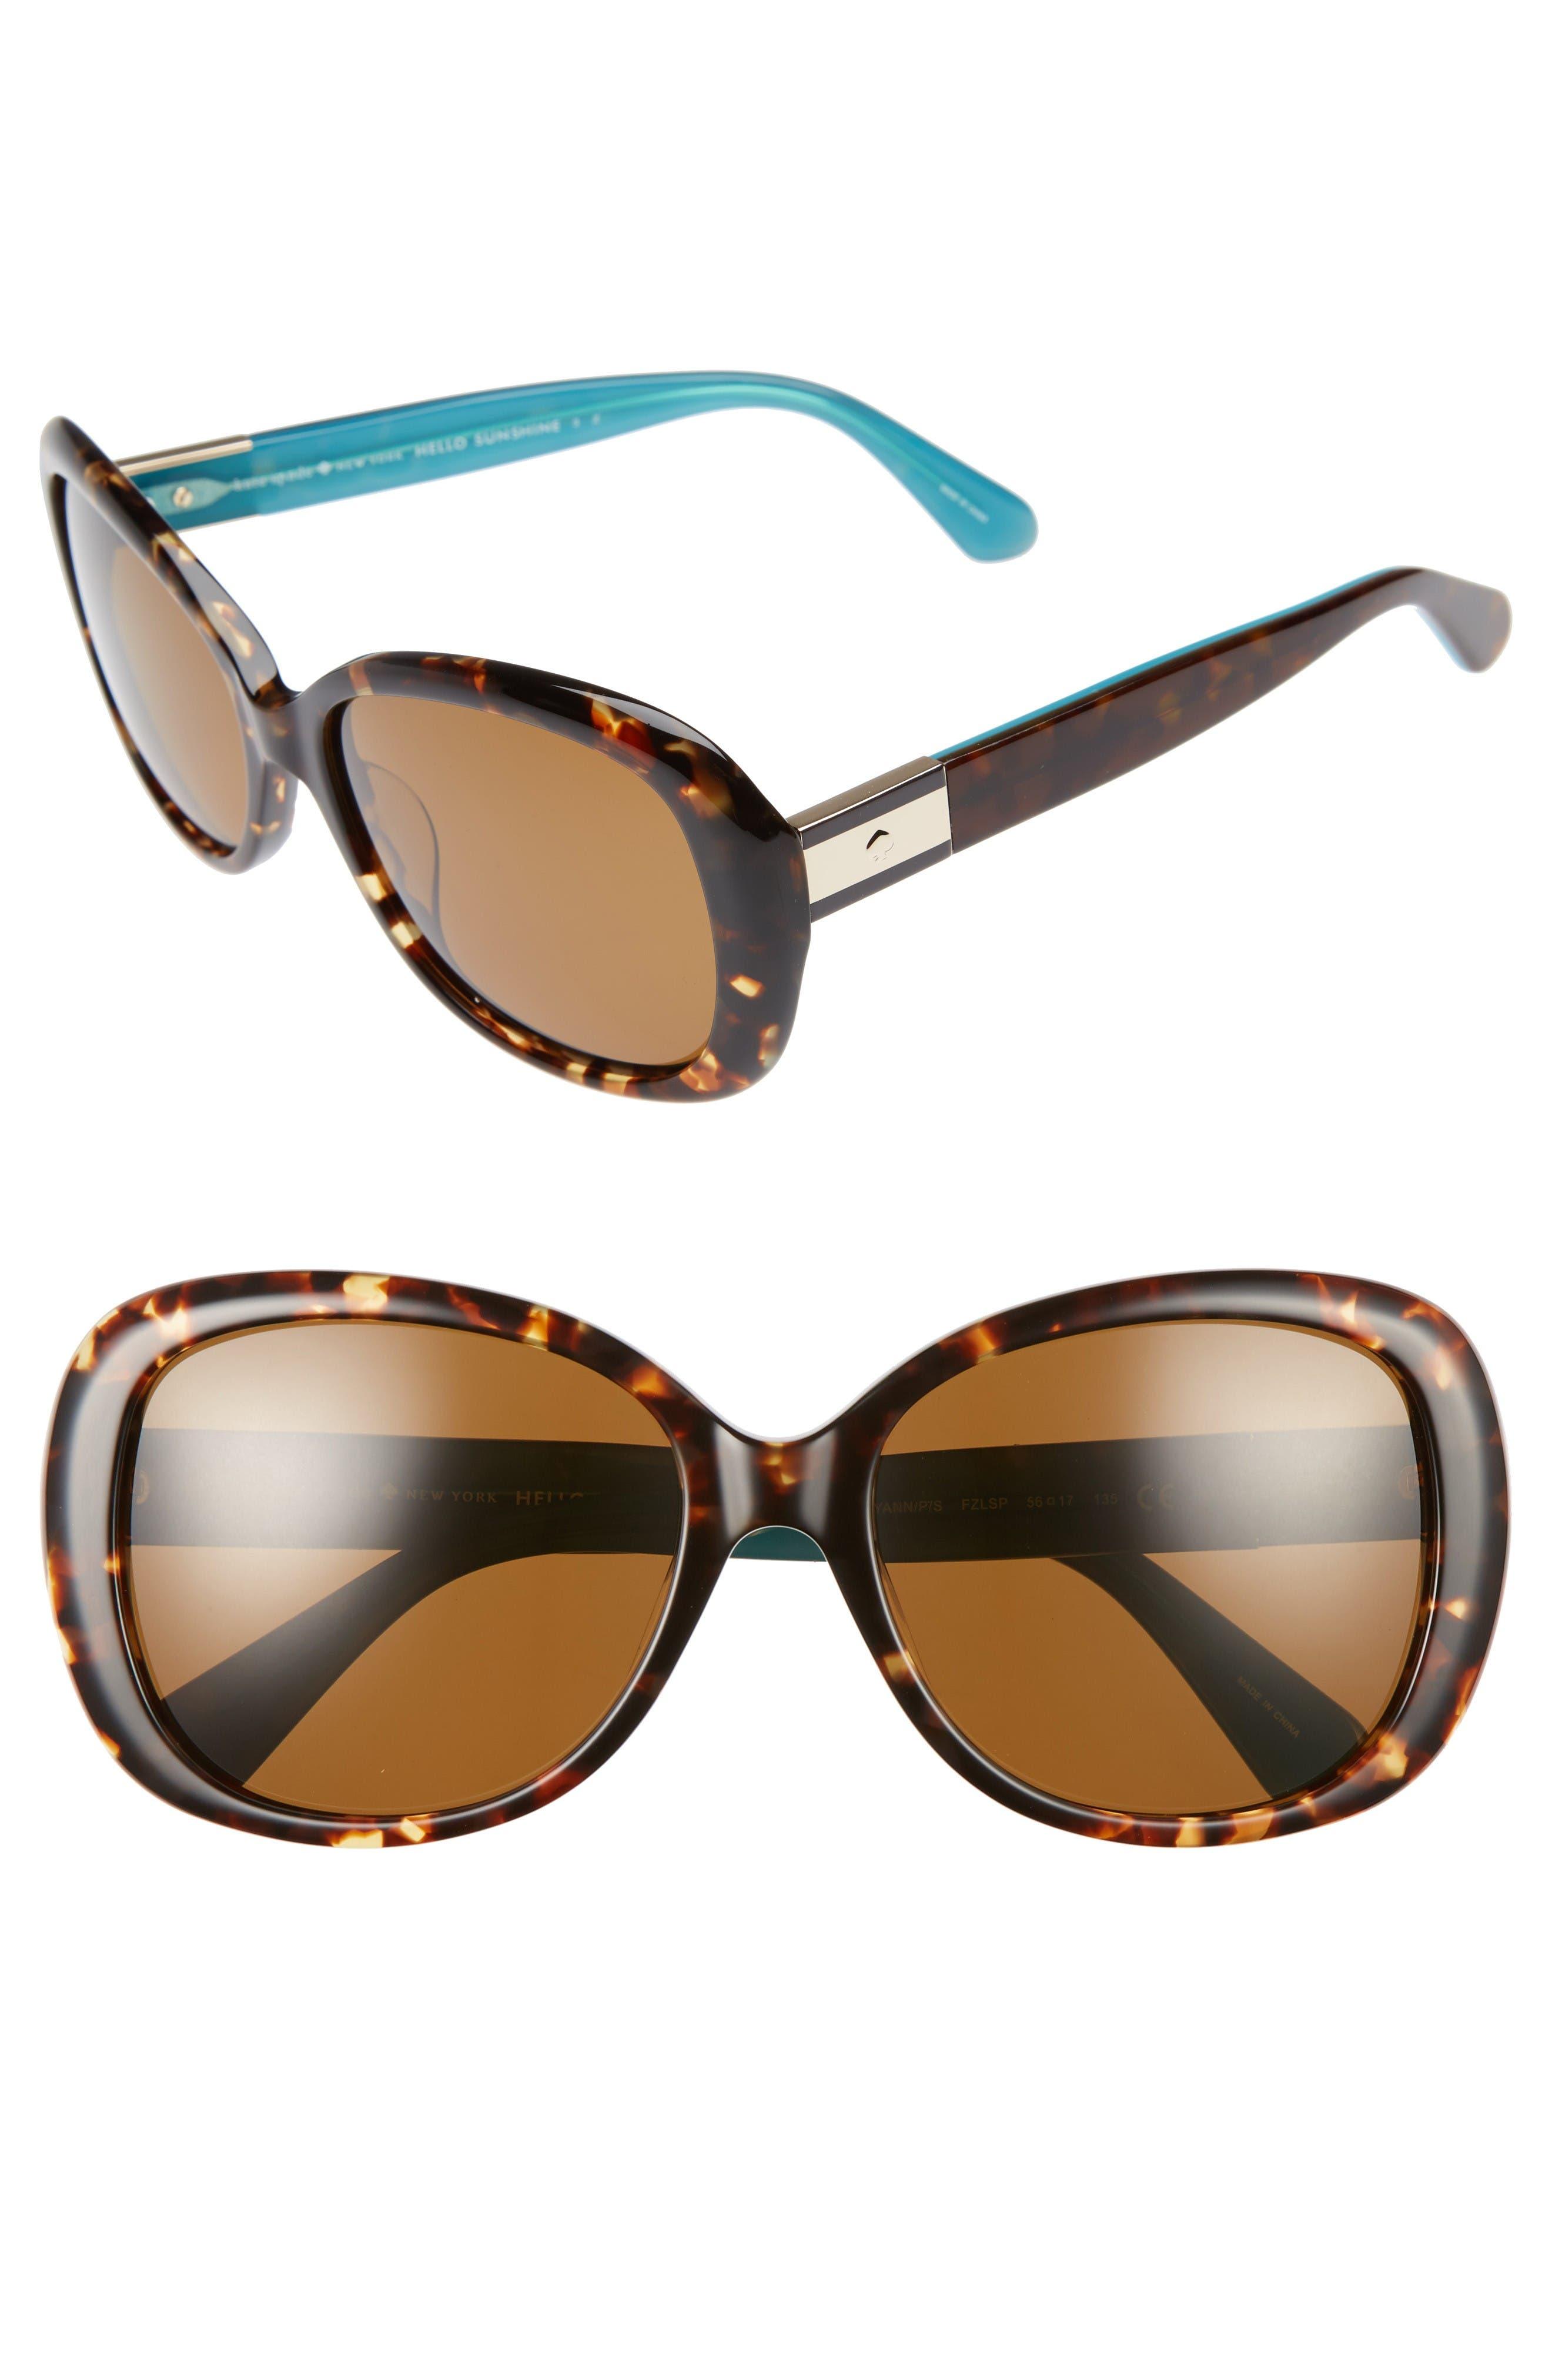 kate spade new york judyann 50mm Sunglasses